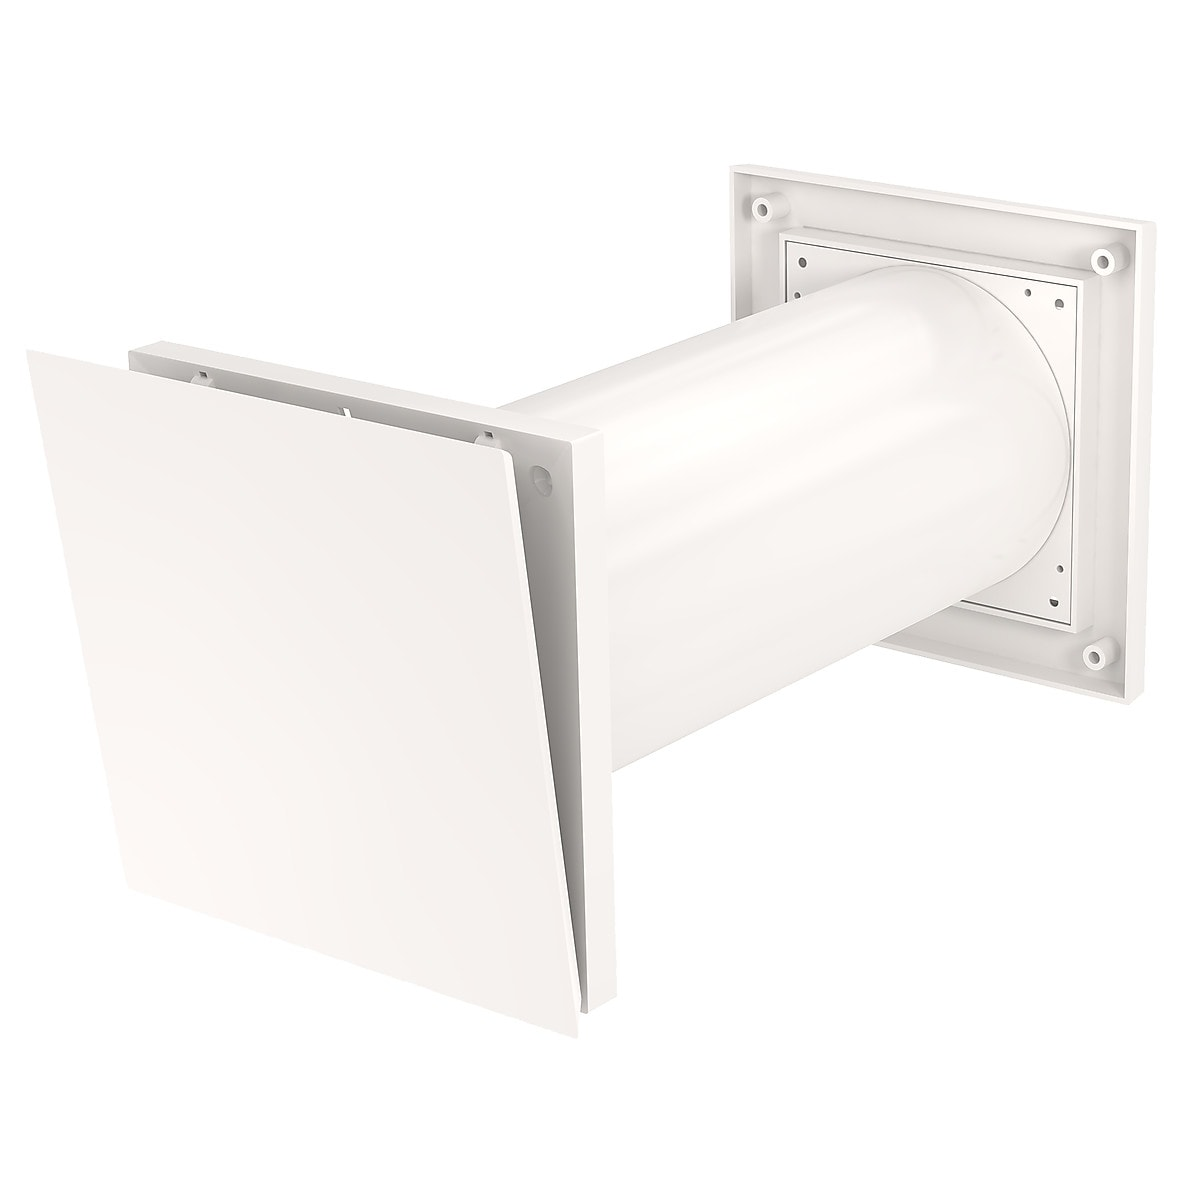 Friskluftsventil med filter